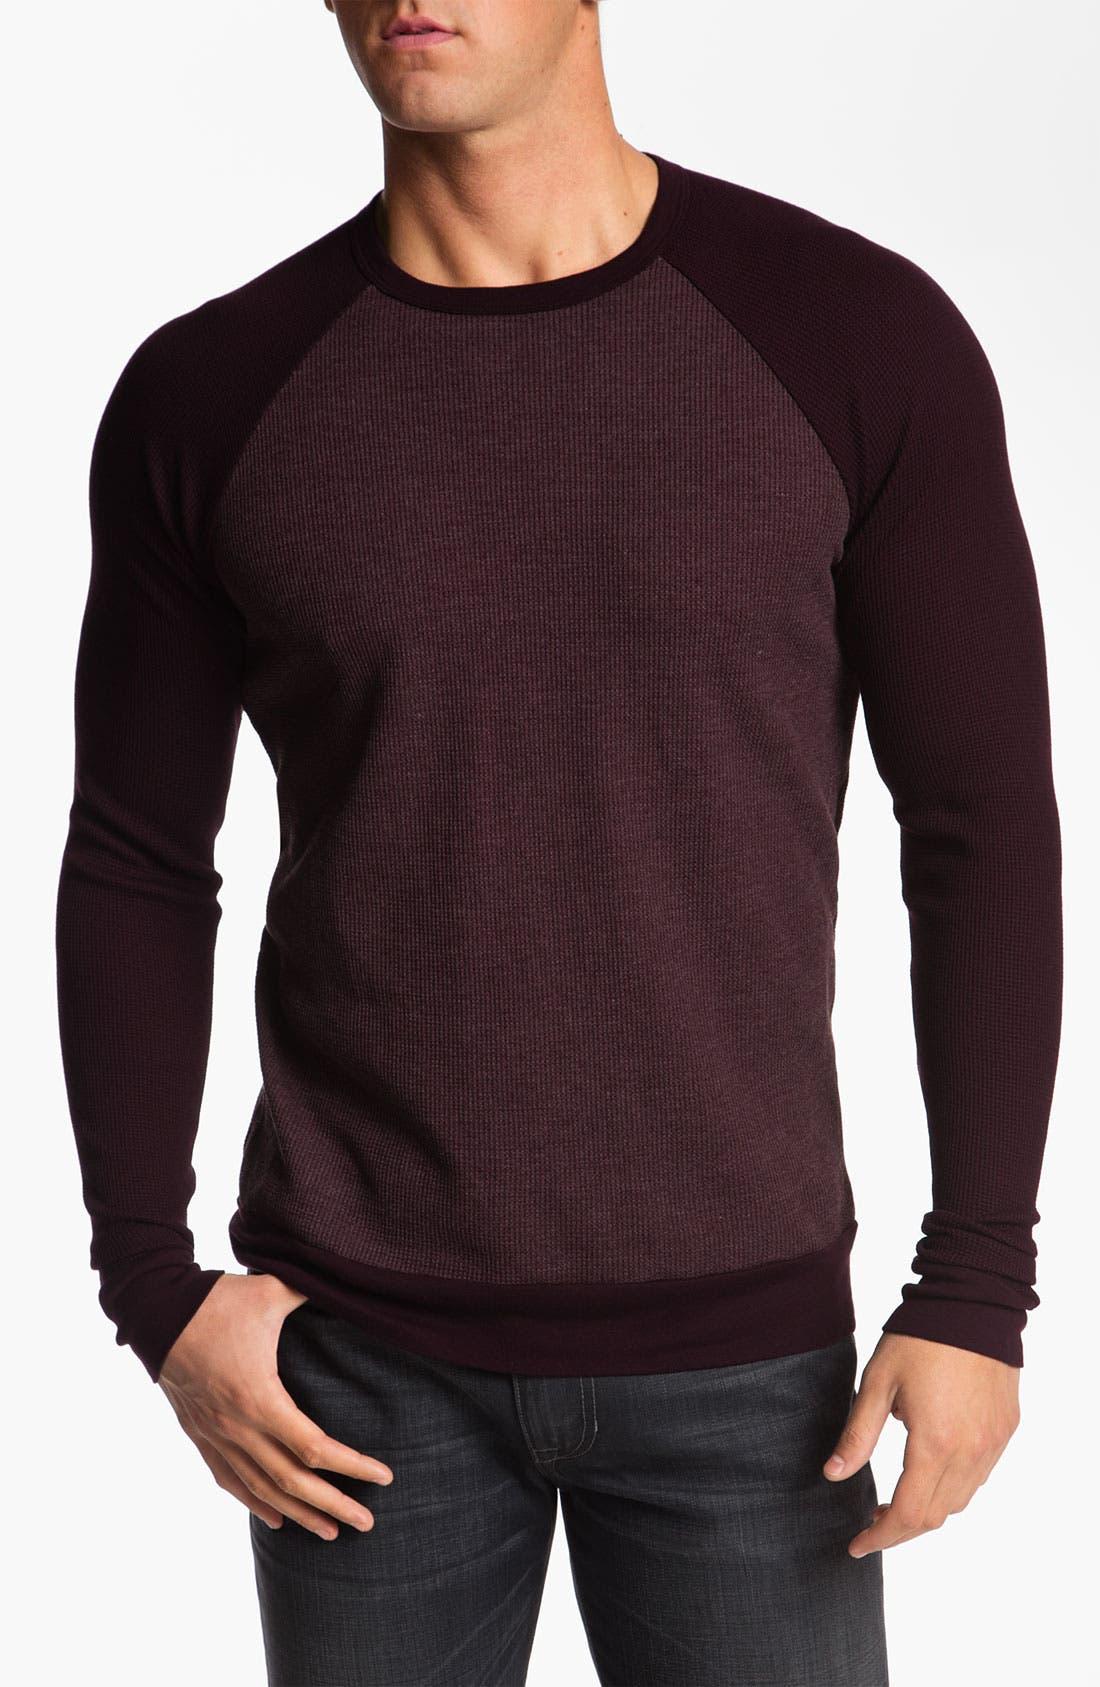 Main Image - Splendid Mills 'Slater' Raglan Sleeve Thermal Shirt